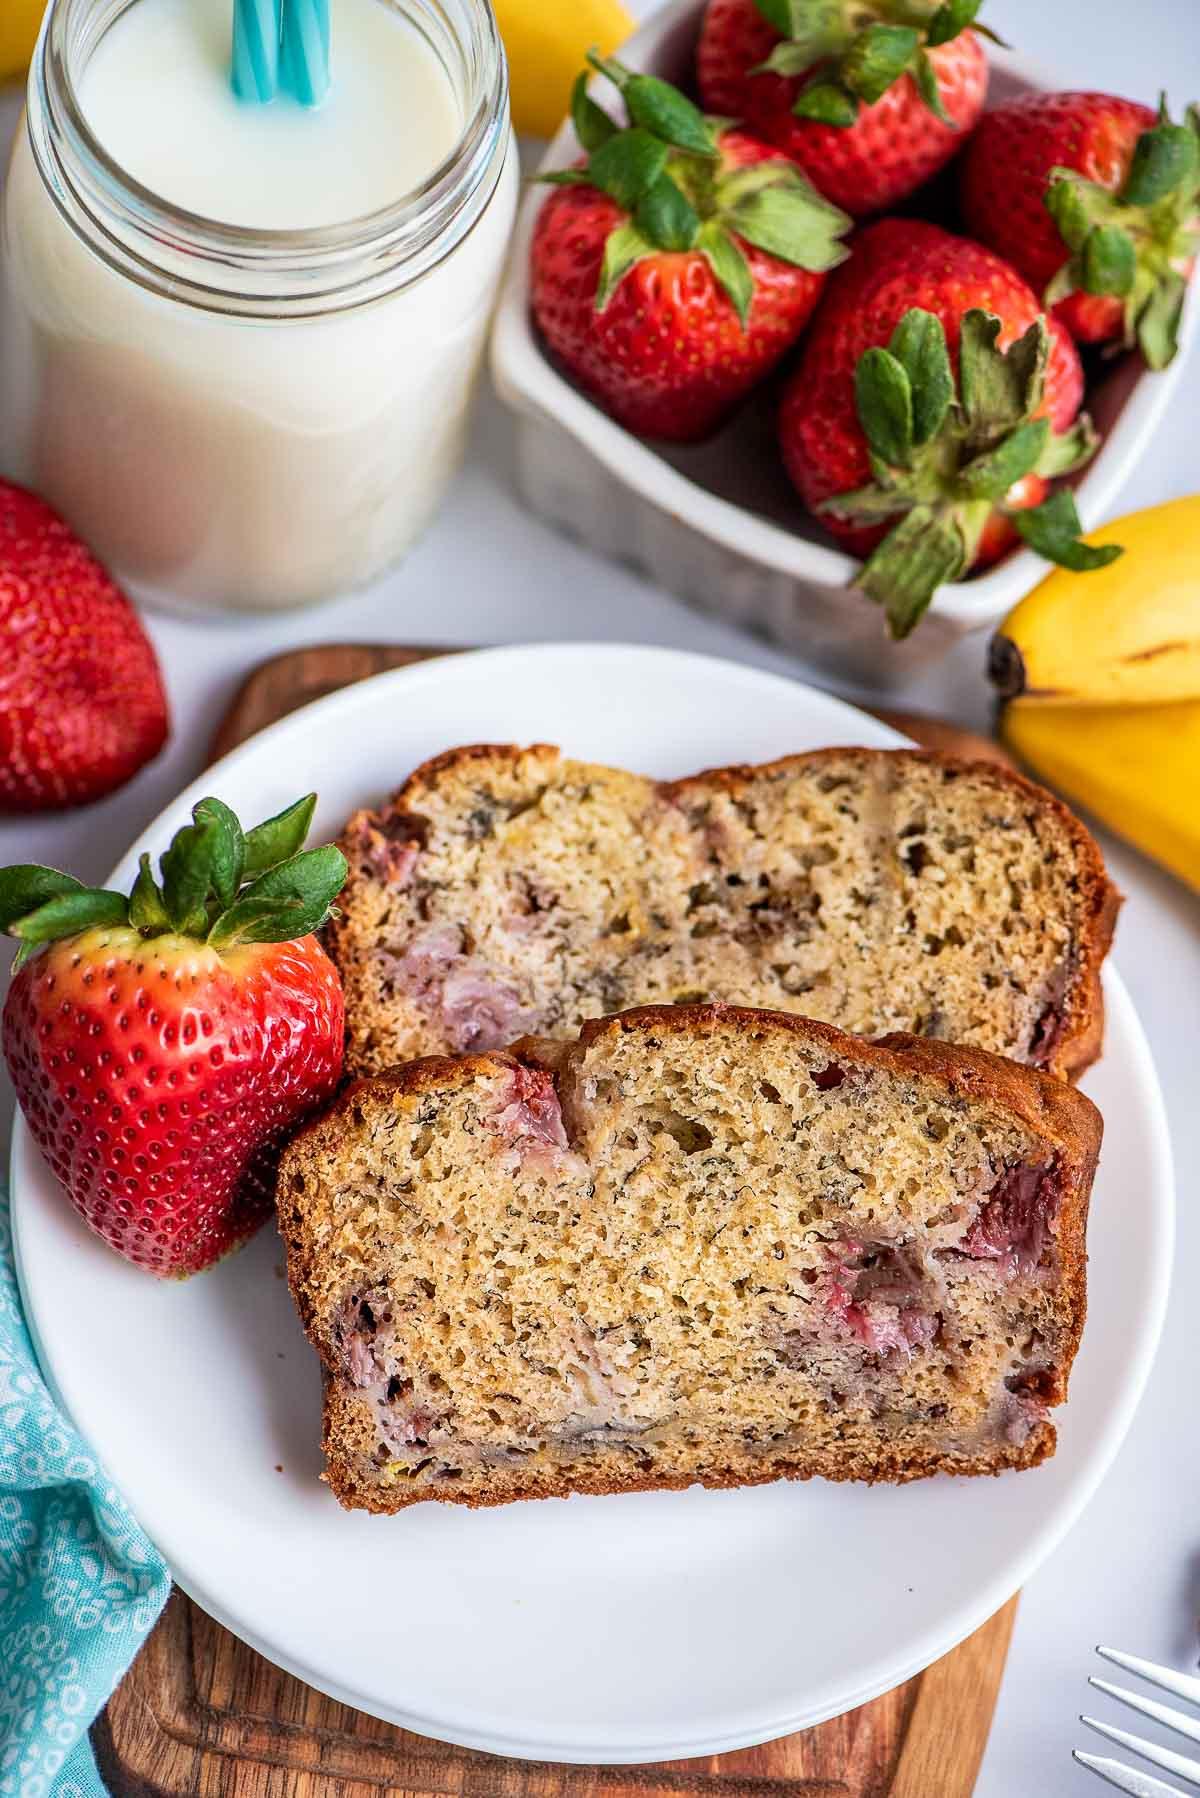 strawberry banana bread sliced on plate